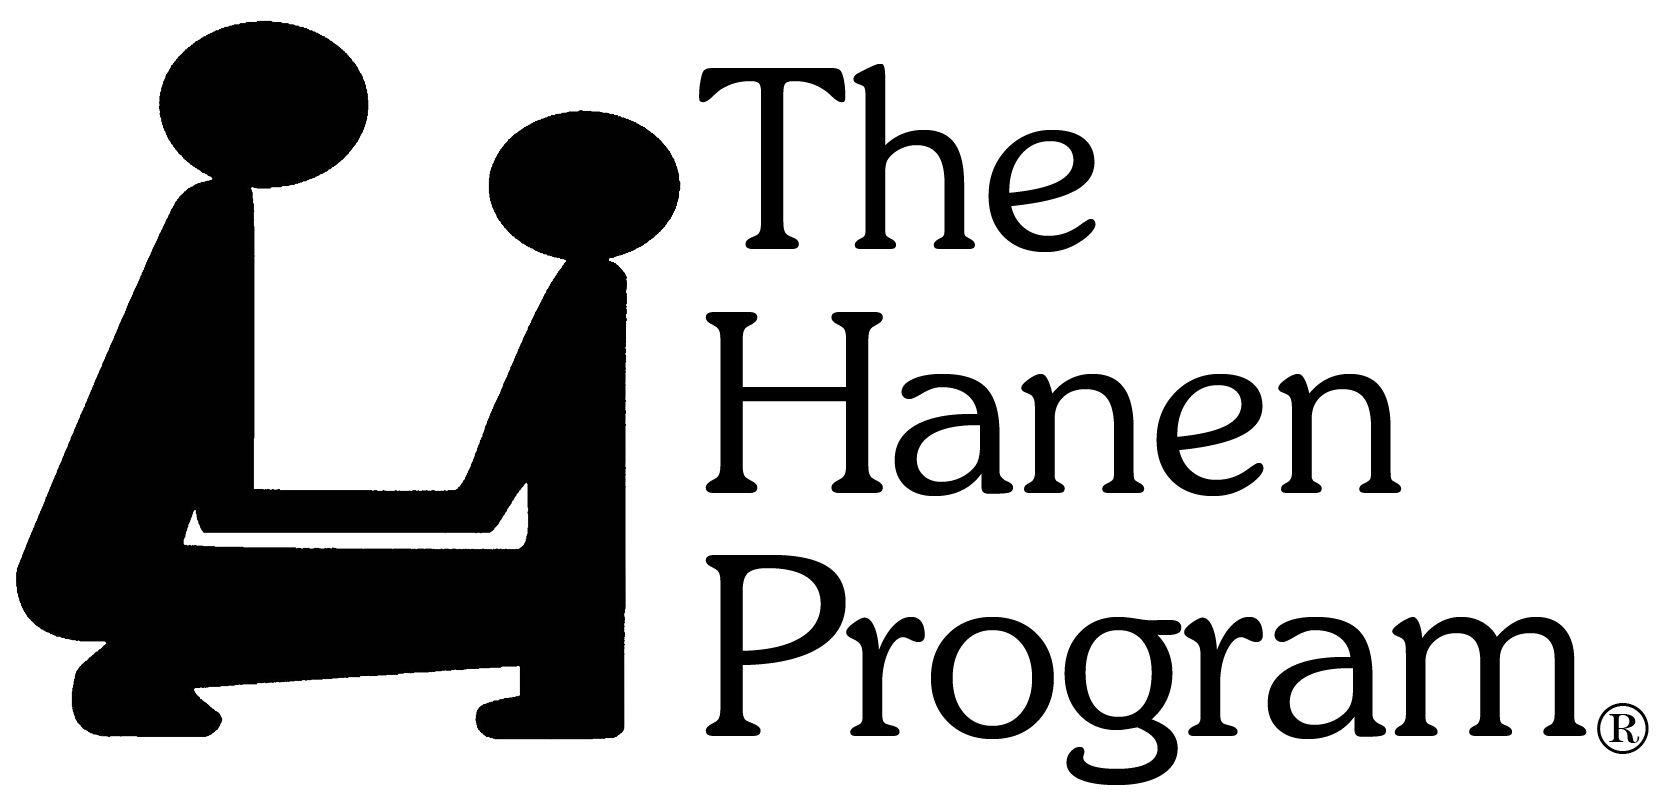 The Hanen Program. A Canadian Organization that promotes